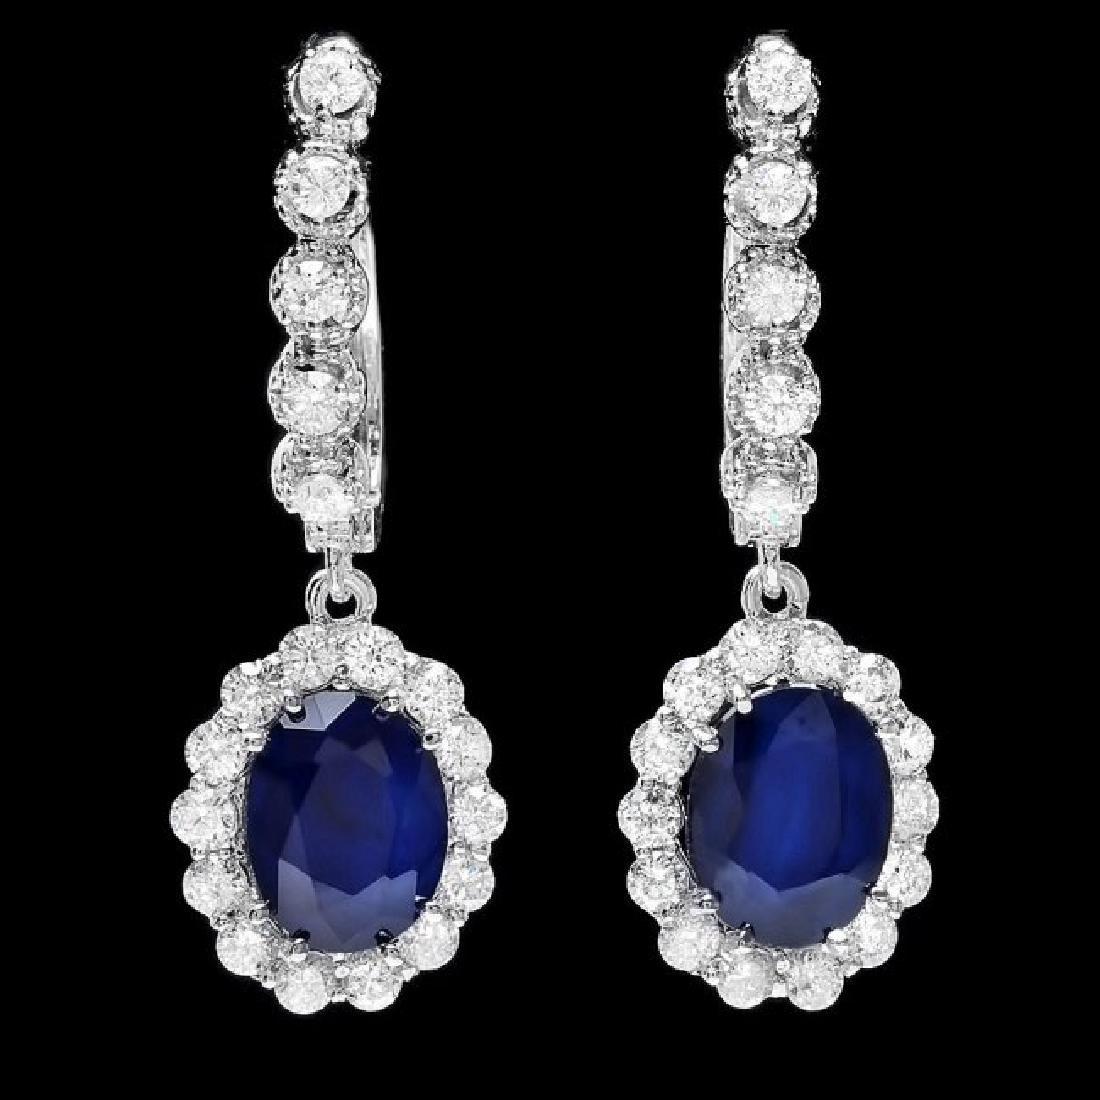 14k Gold 4ct Sapphire 1.40ct Diamond Earrings